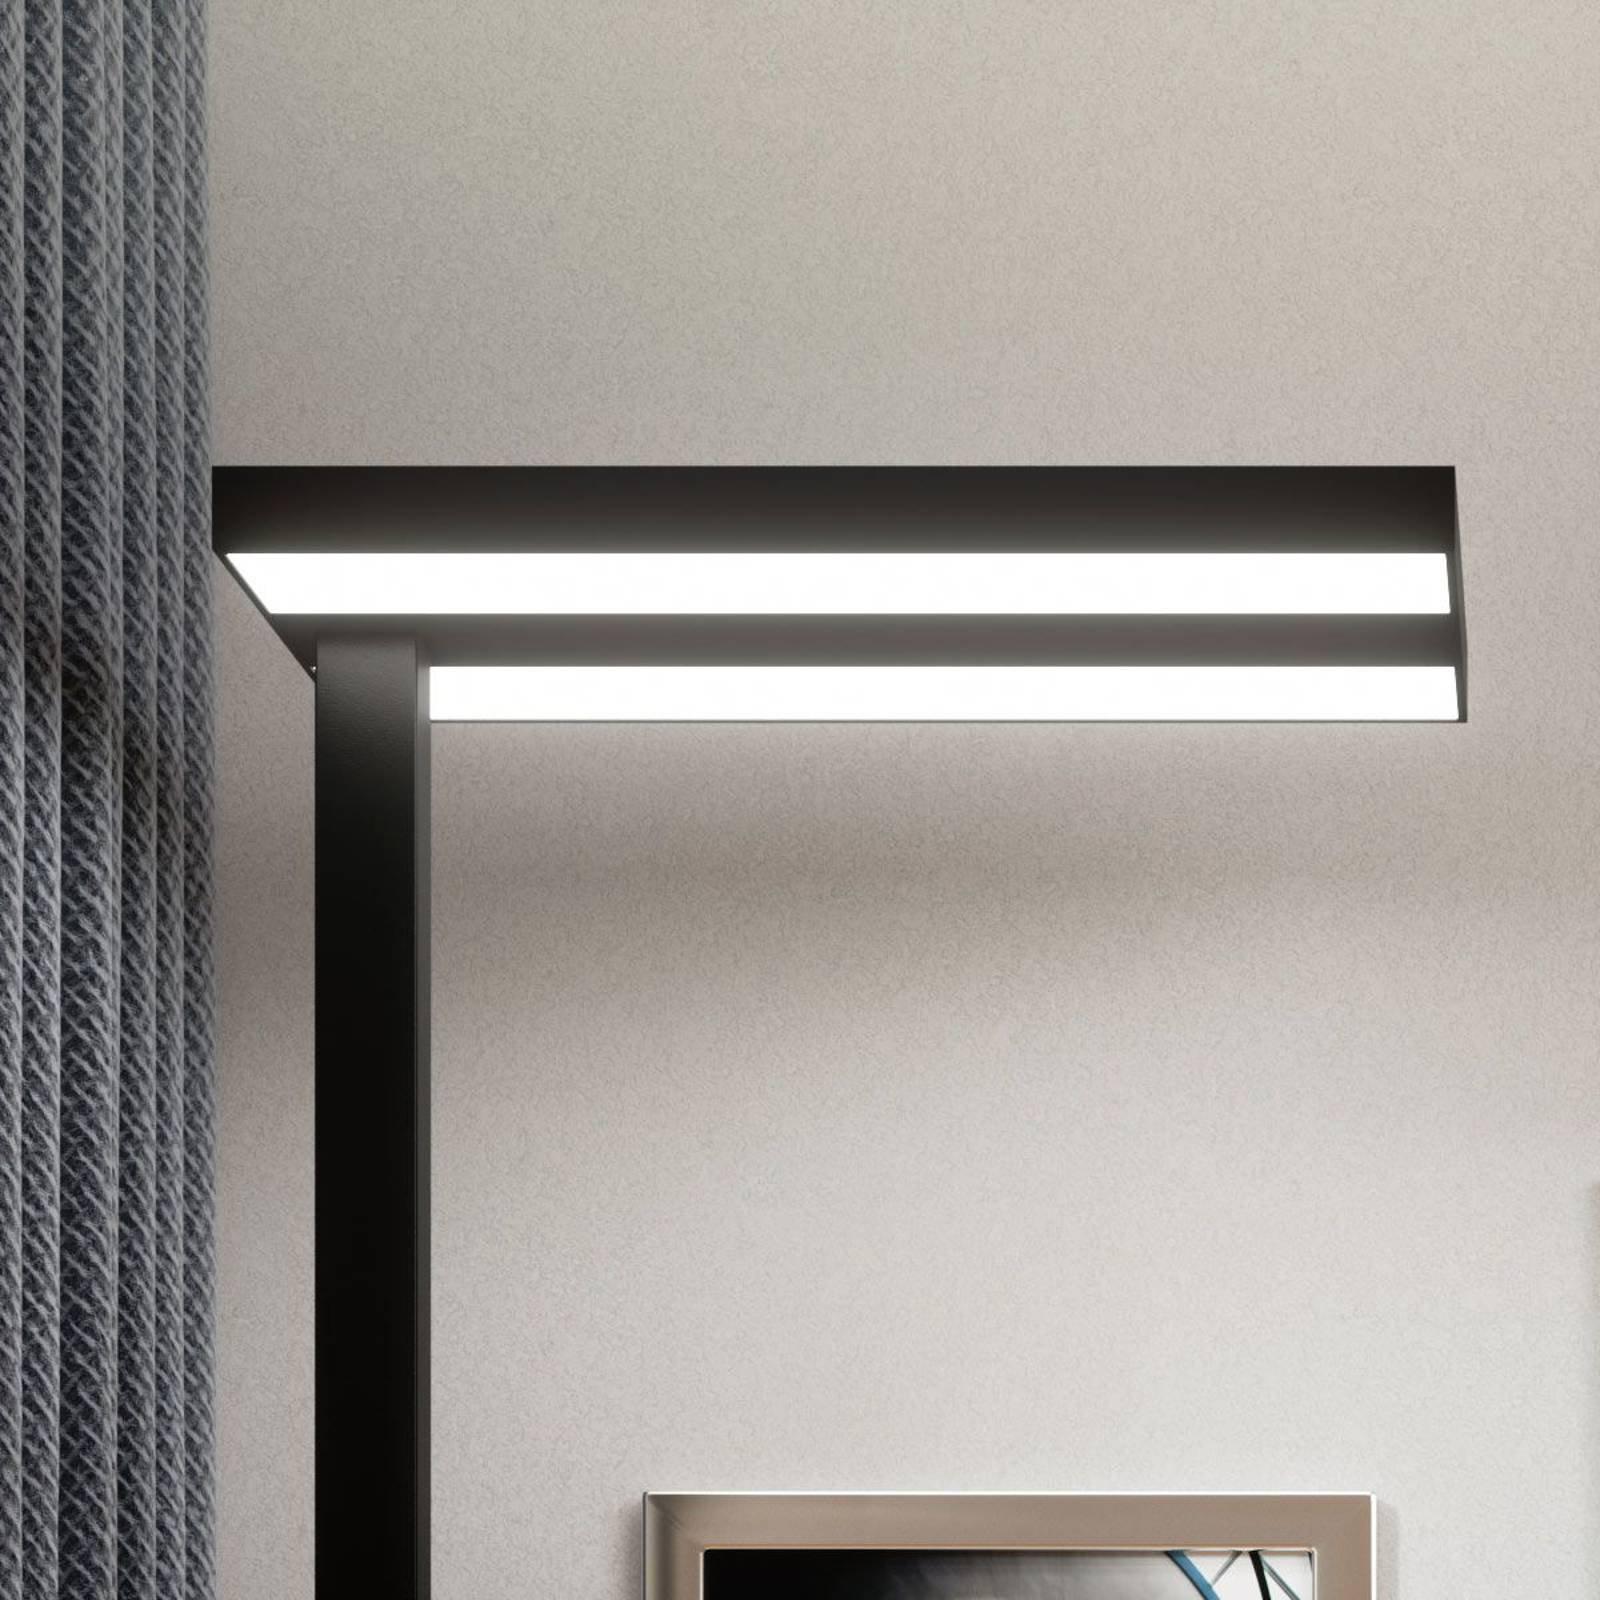 LED-gulvlampe Logan i svart til kontoret, dimbar